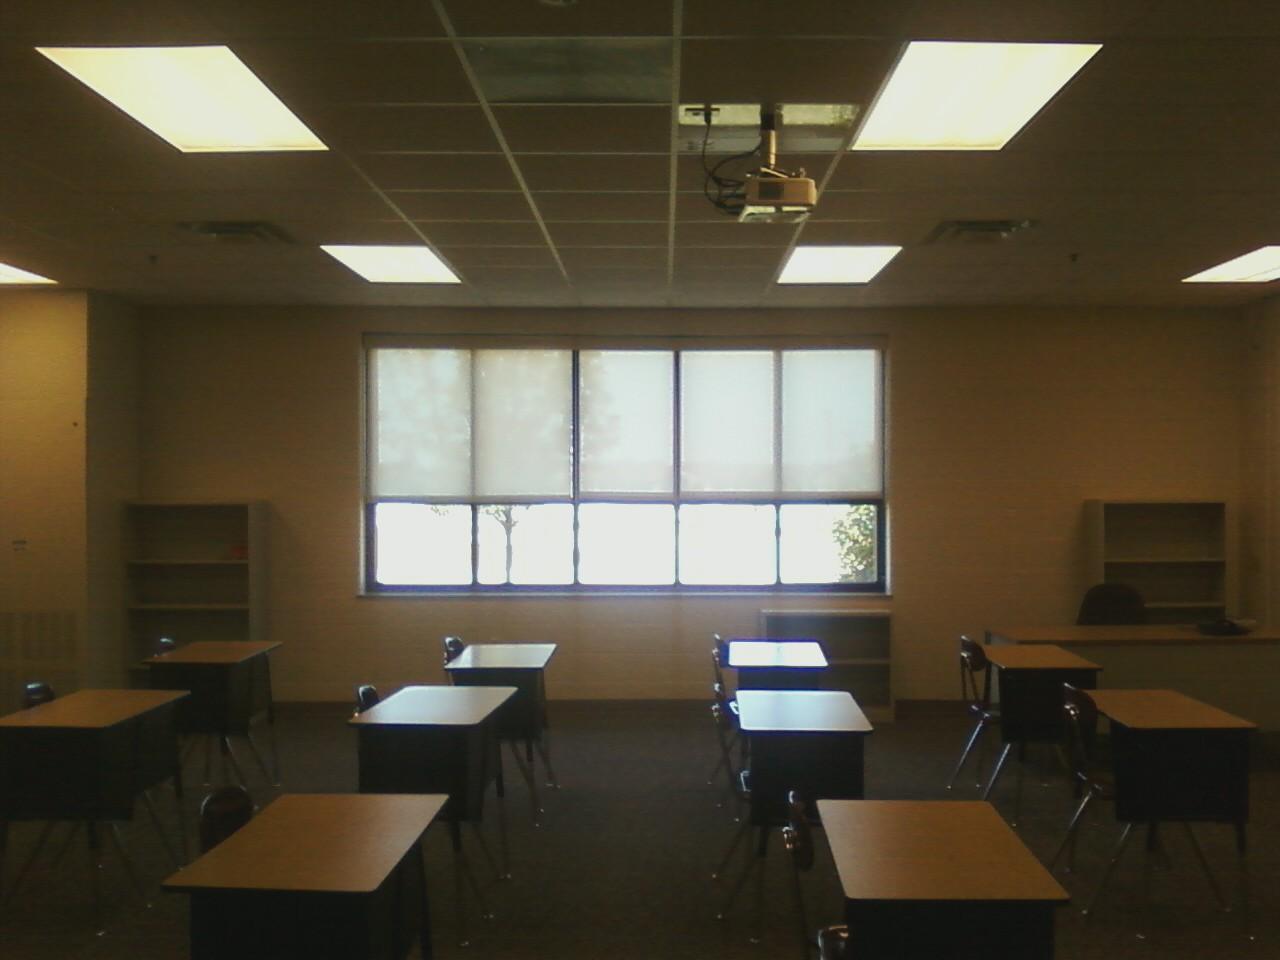 Classroom Decoration Window ~ Hoosier teacher home sweet classroom curtains